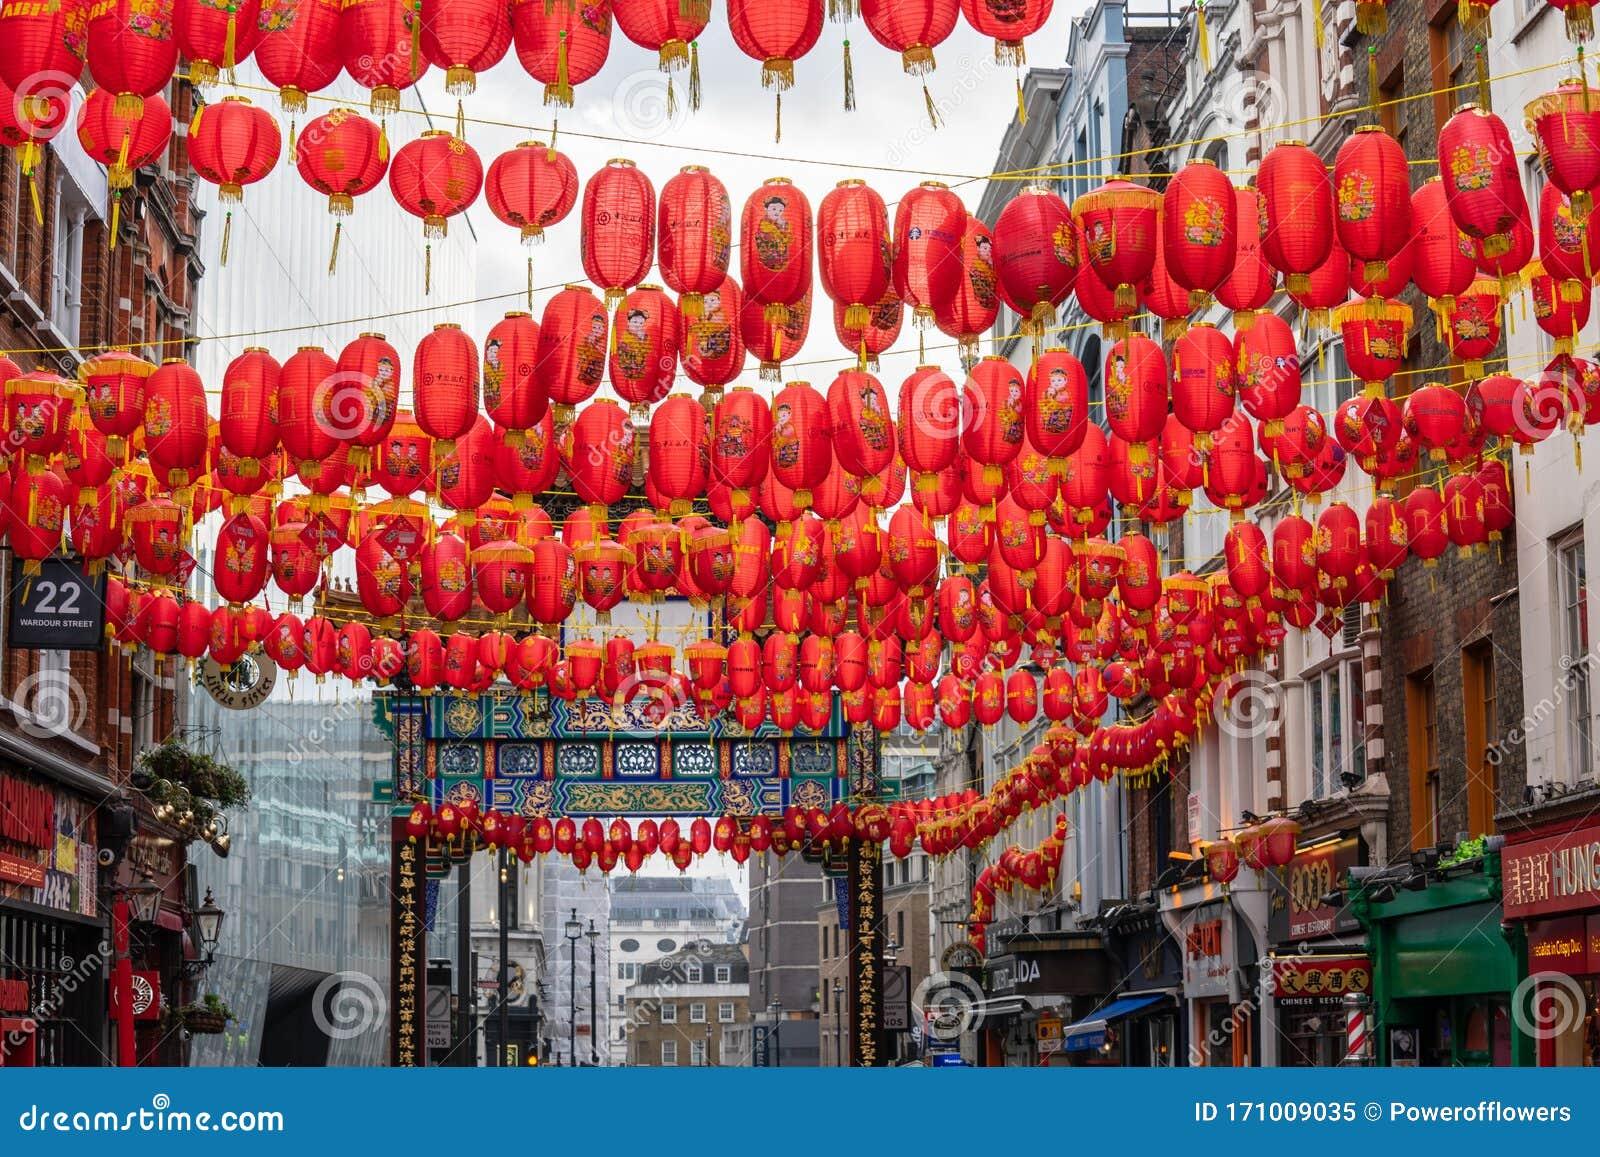 London January 26 2020 Chinese Paper Lanterns London Chinatown Chinese New Year Celebrations Editorial Image Image Of Lantern Background 171009035